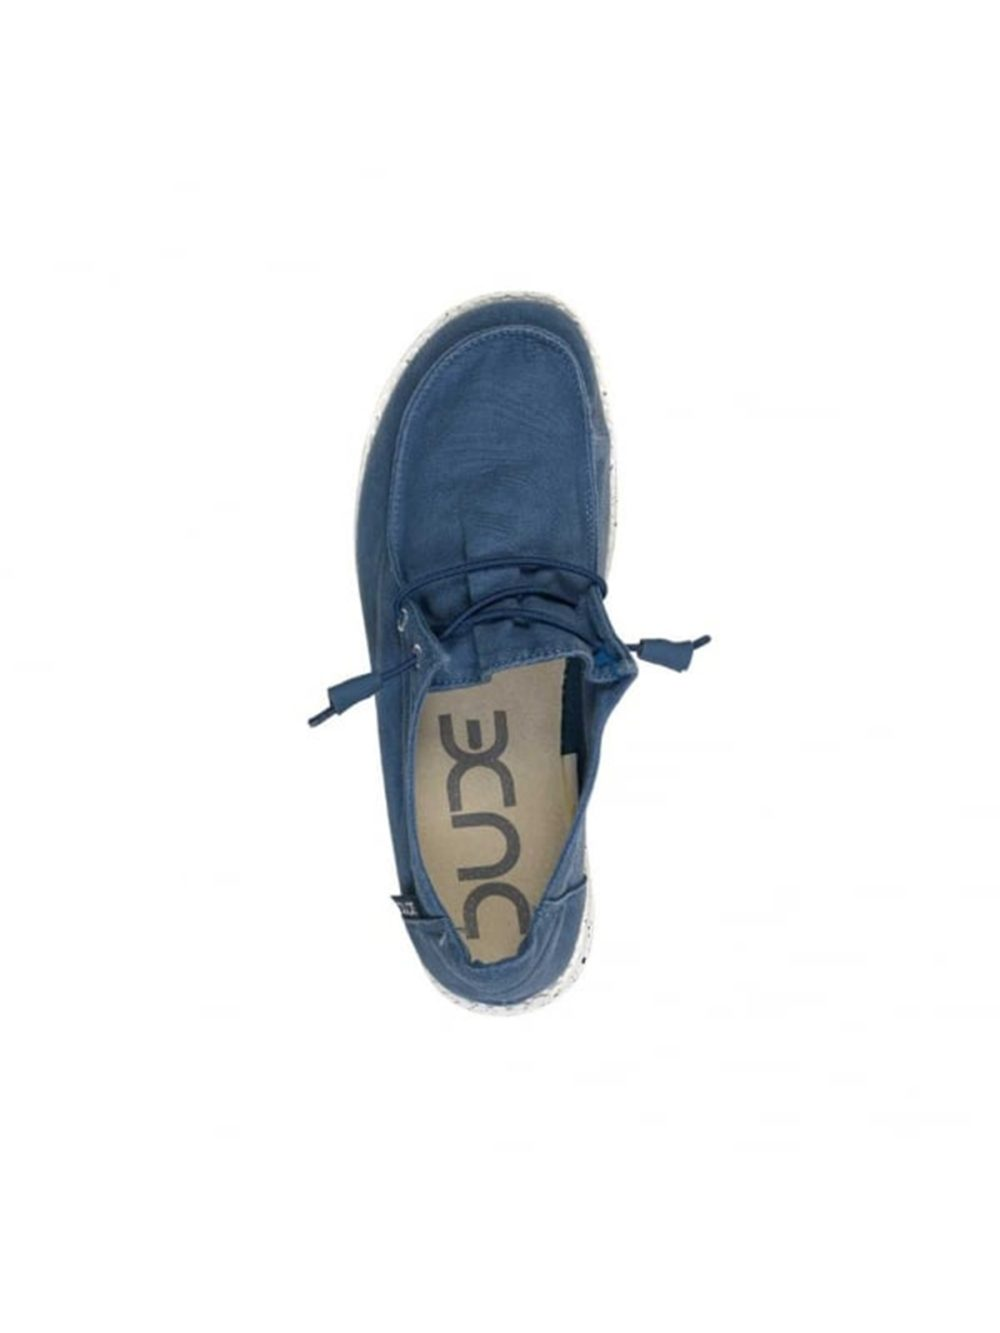 Wendy Sandstone Canvas Hey Dude Shoes Katie Kerr Women's Clothing